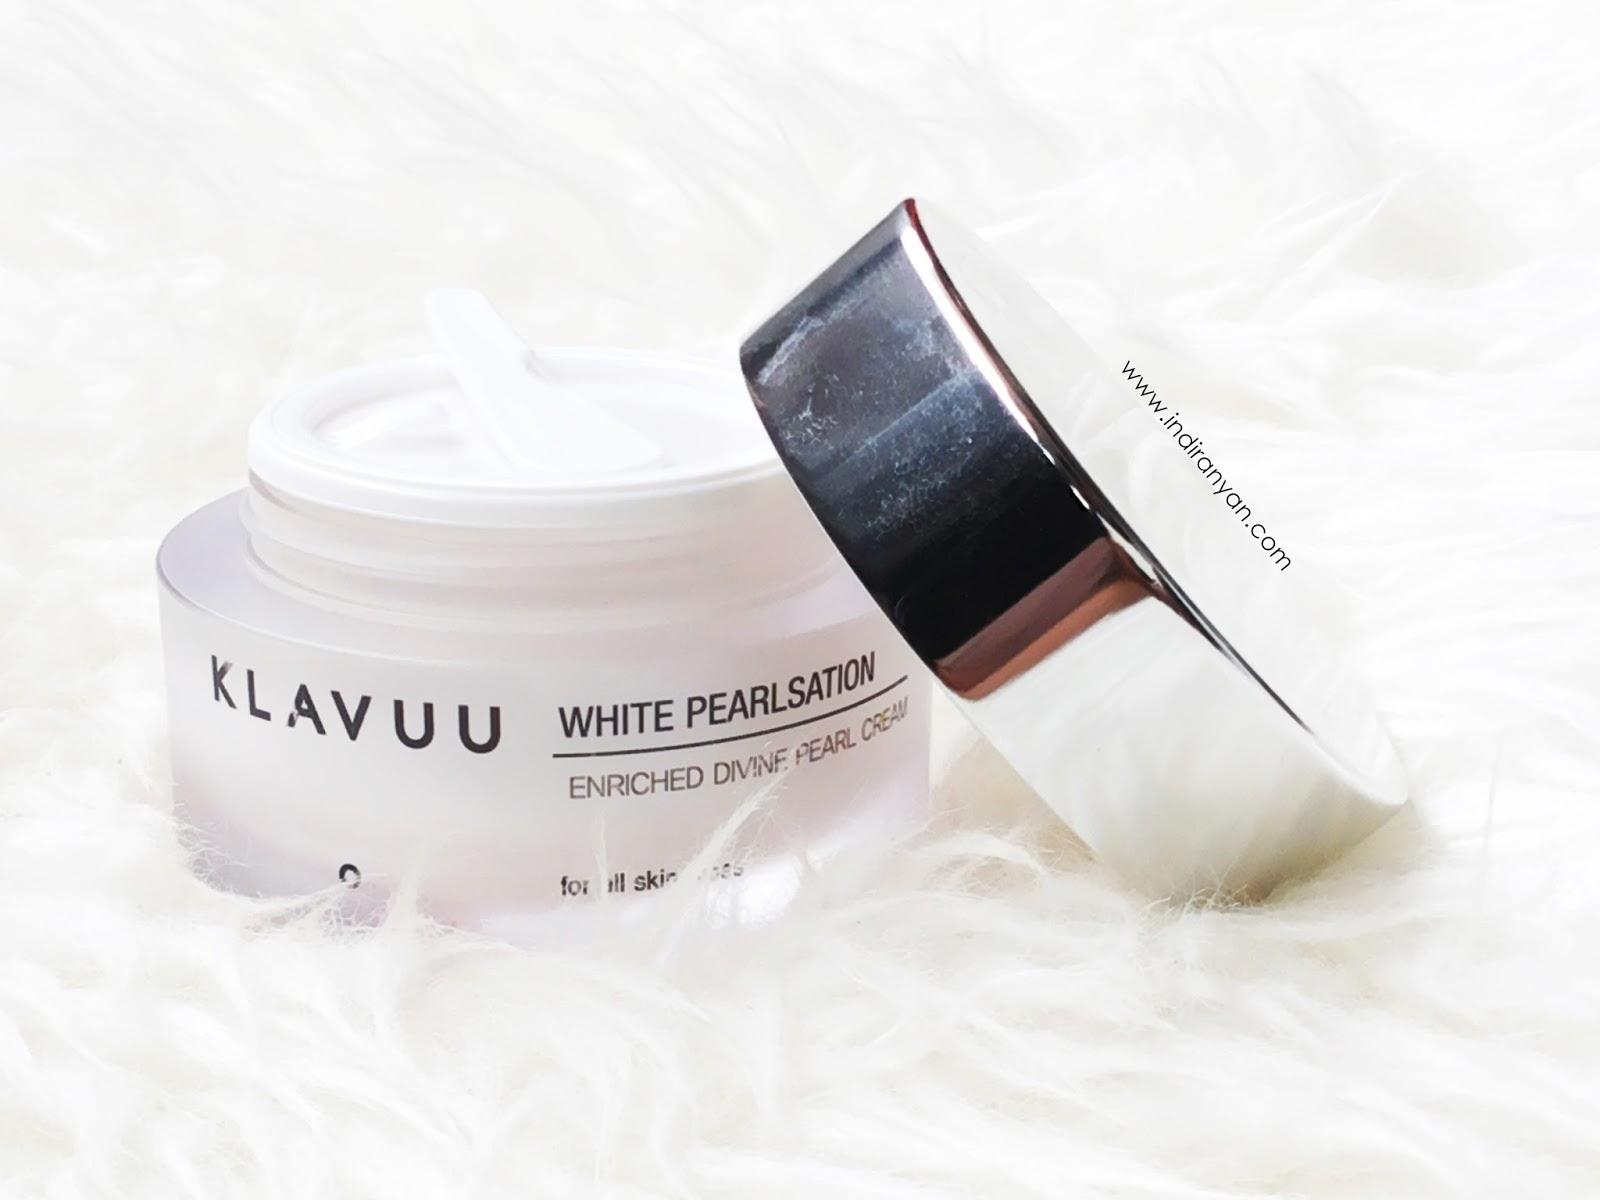 klavuu-white-pearlsation-enriched-divine-pearl-cream-review